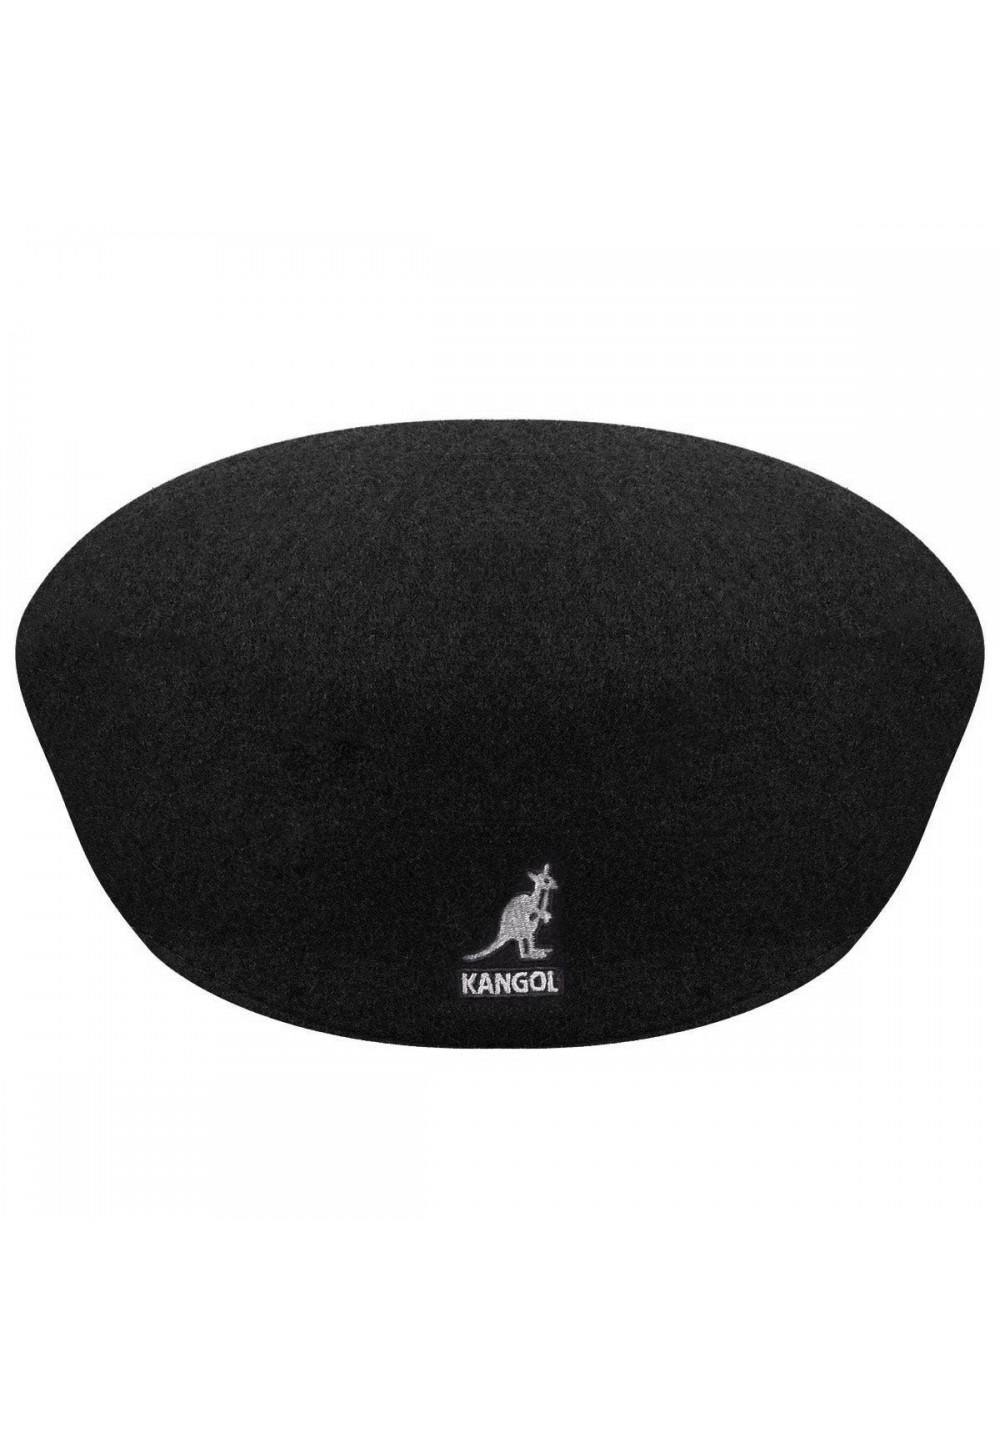 Кепка Kangol Wool 504 в черном цвете